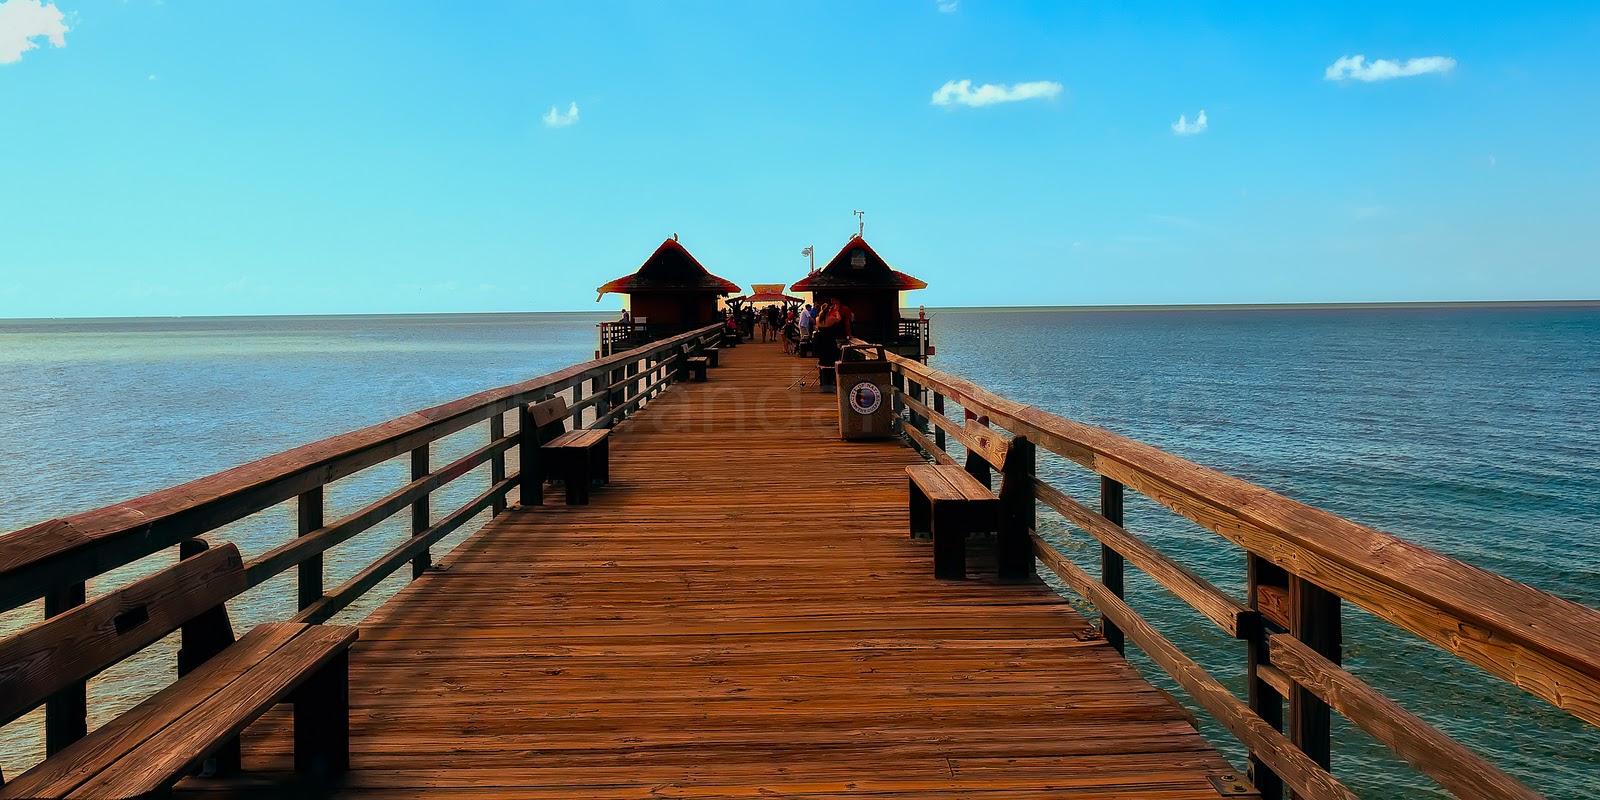 JP BRANDANO: FLORIDAS FINE ART PHOTOGRAPHERS: THE